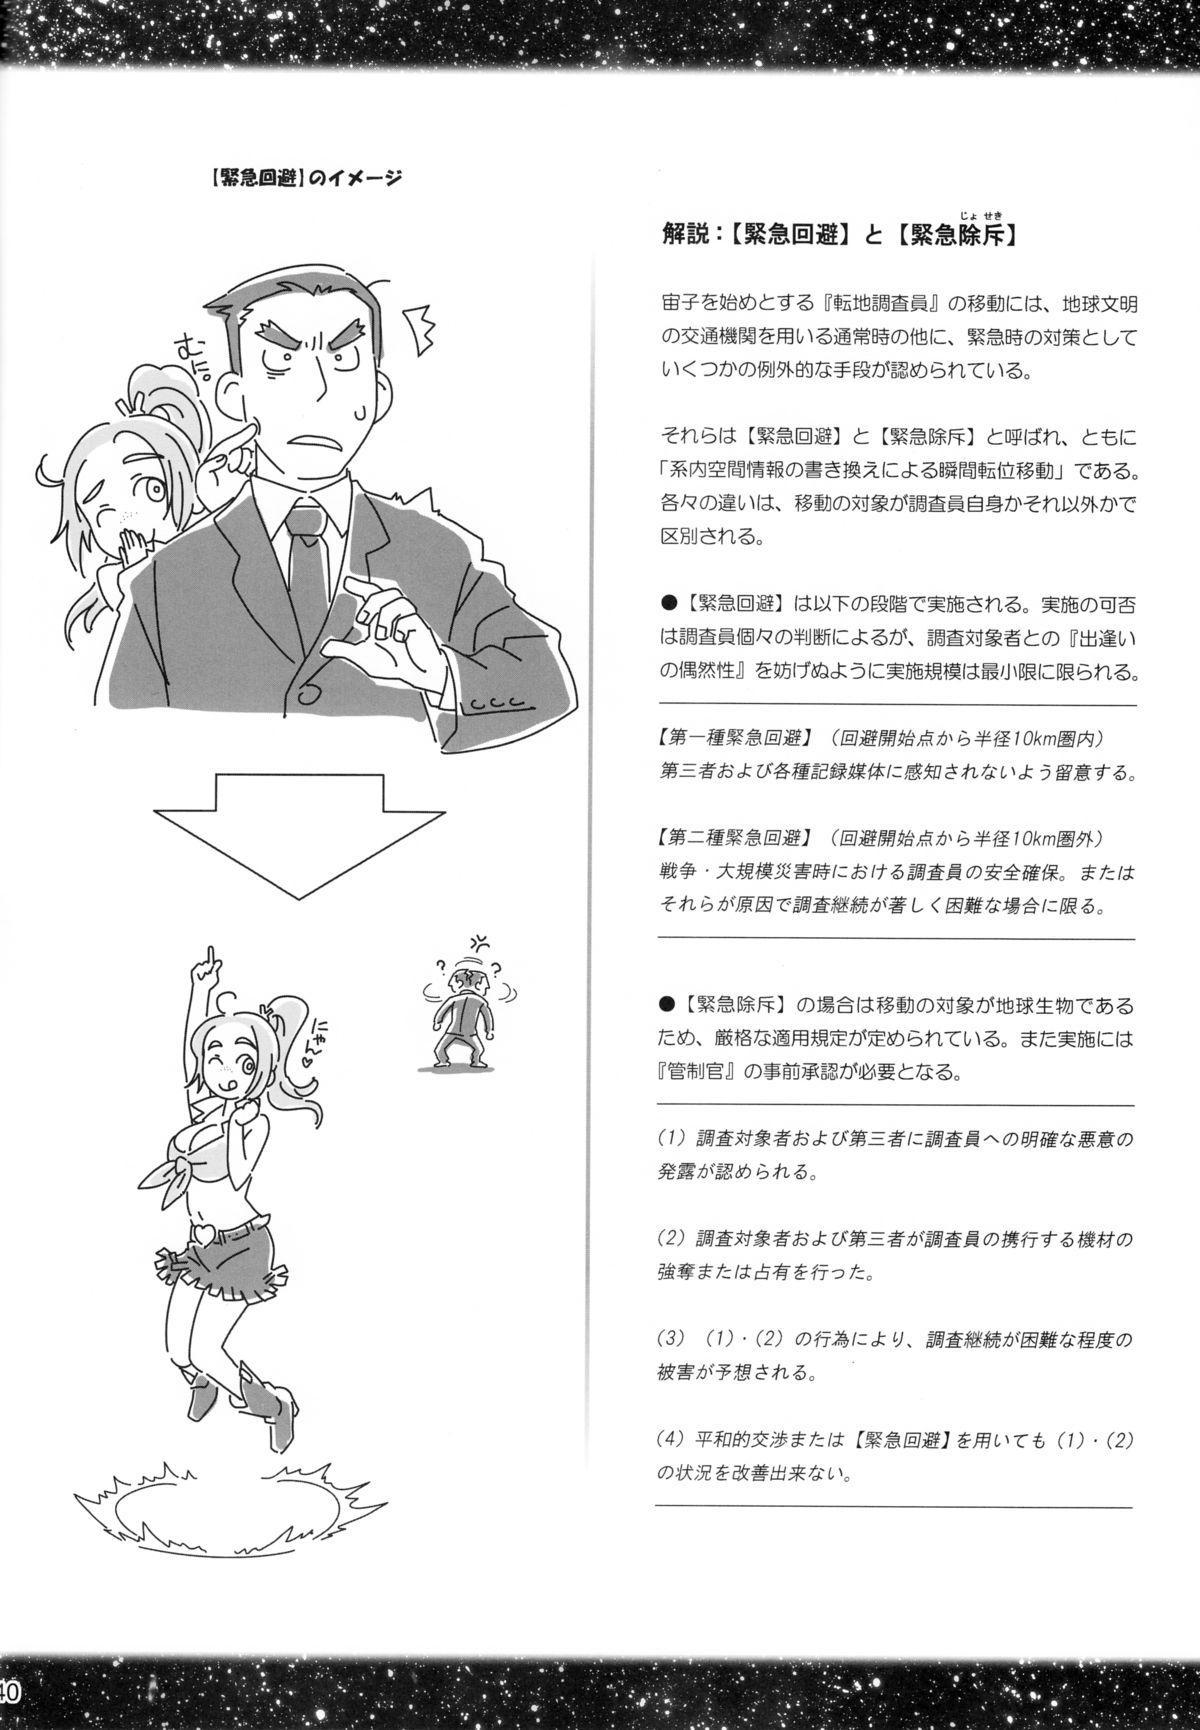 Sorako no Tabi 6 38